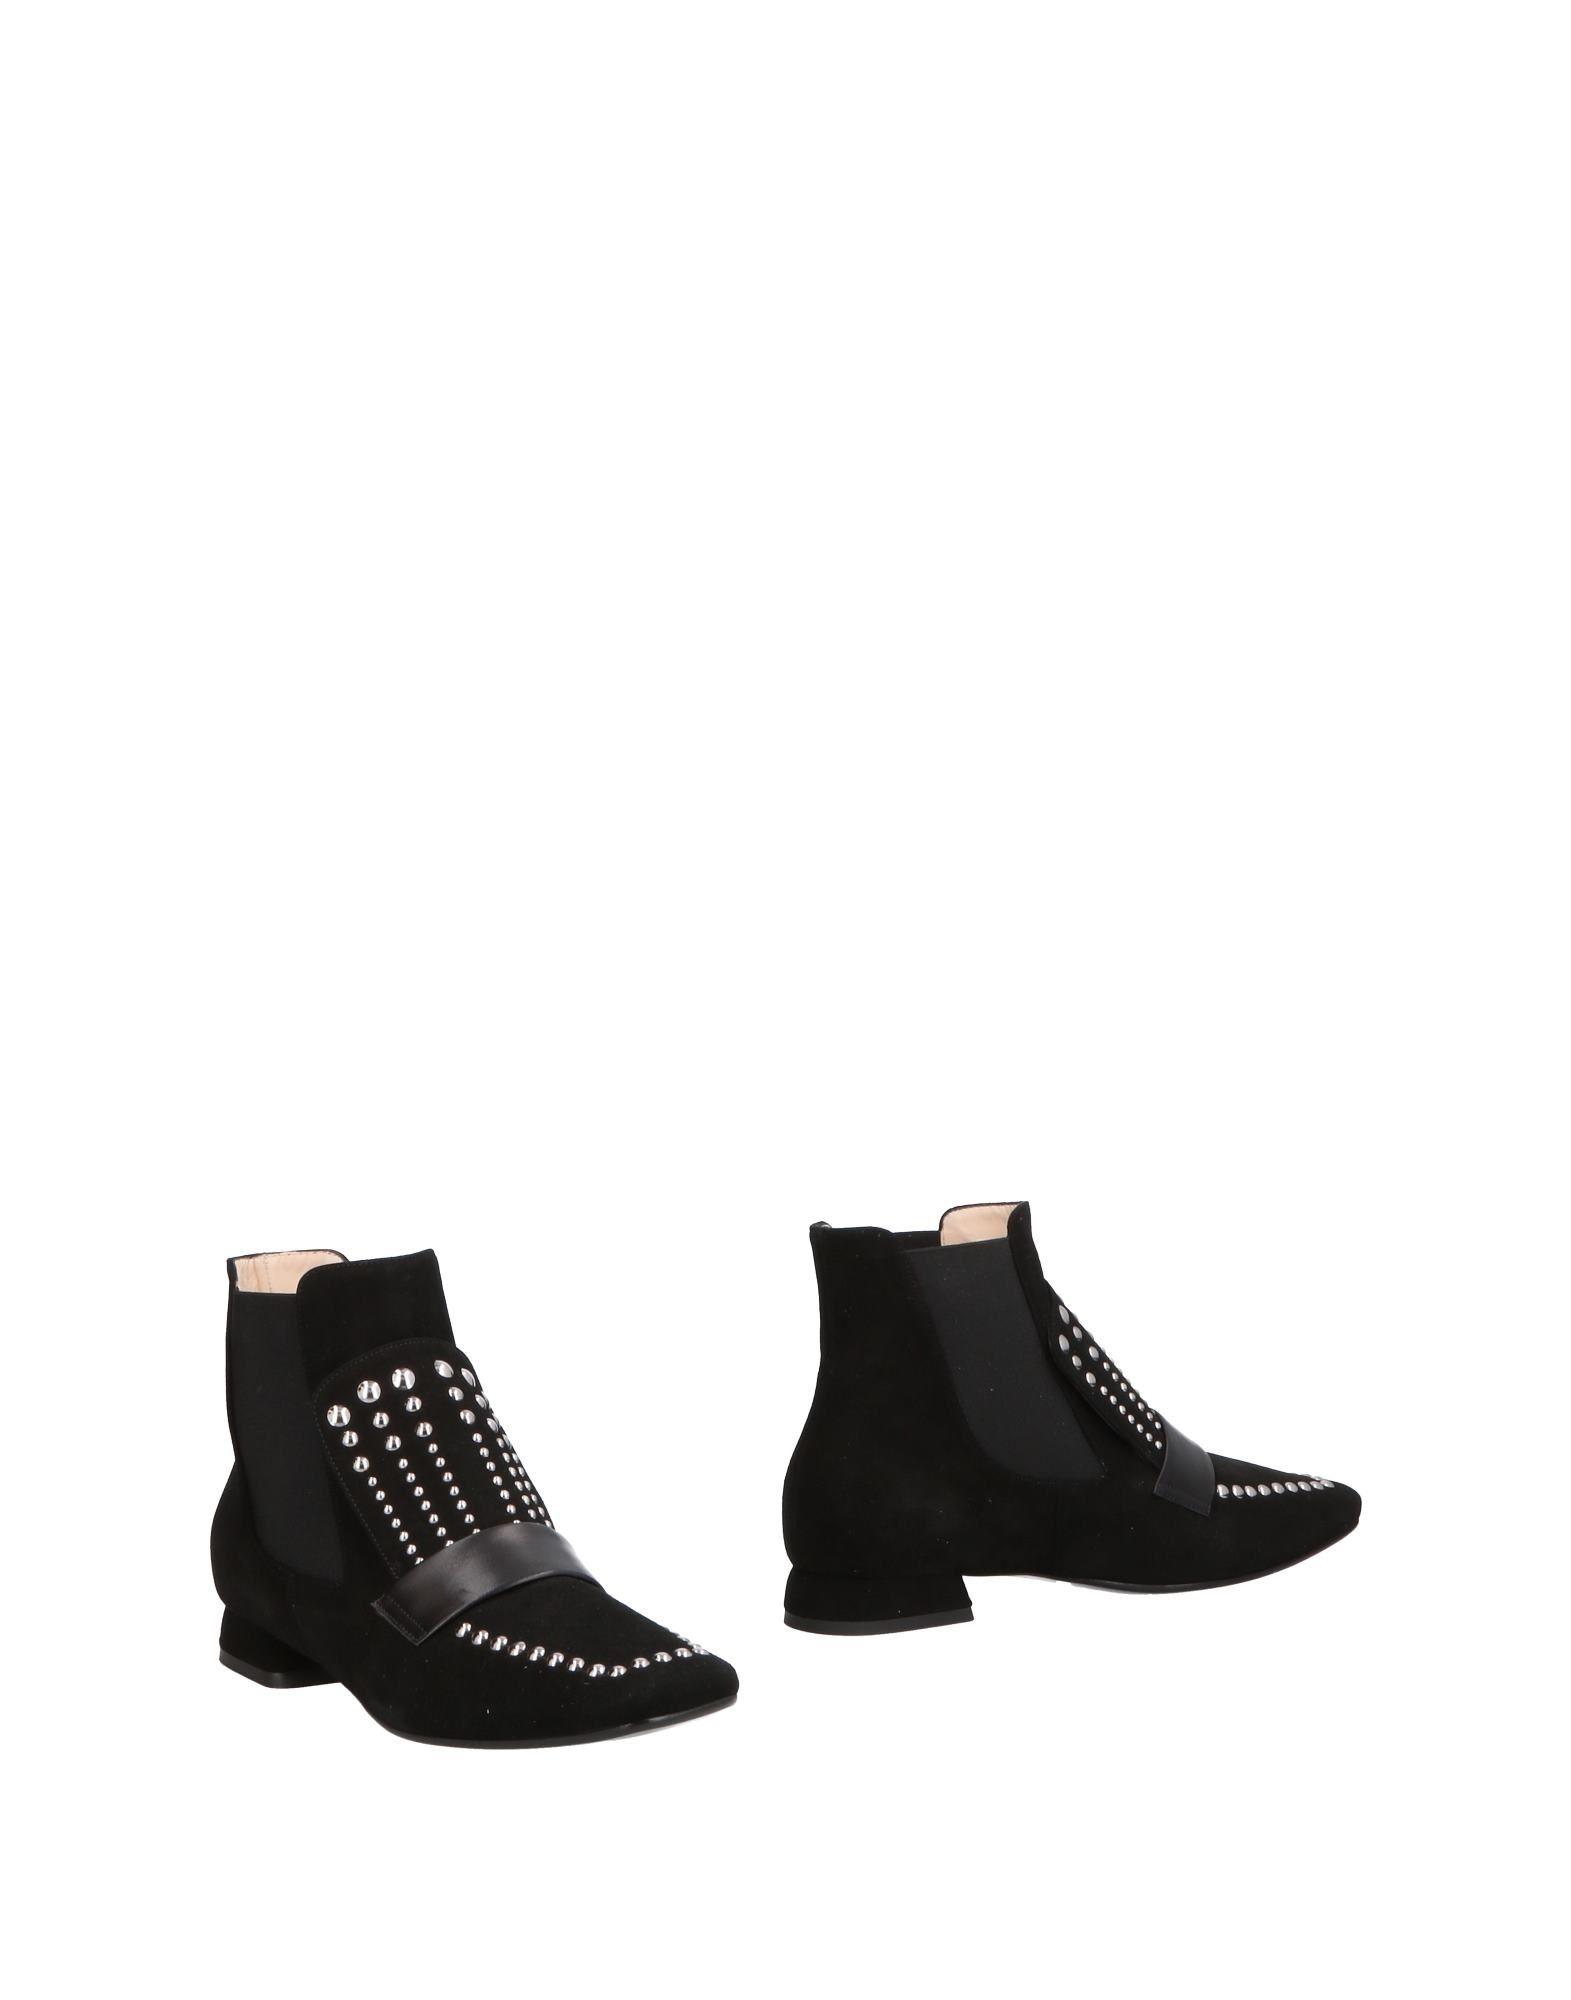 MARIE ELODIE Полусапоги и высокие ботинки marie elodie мокасины